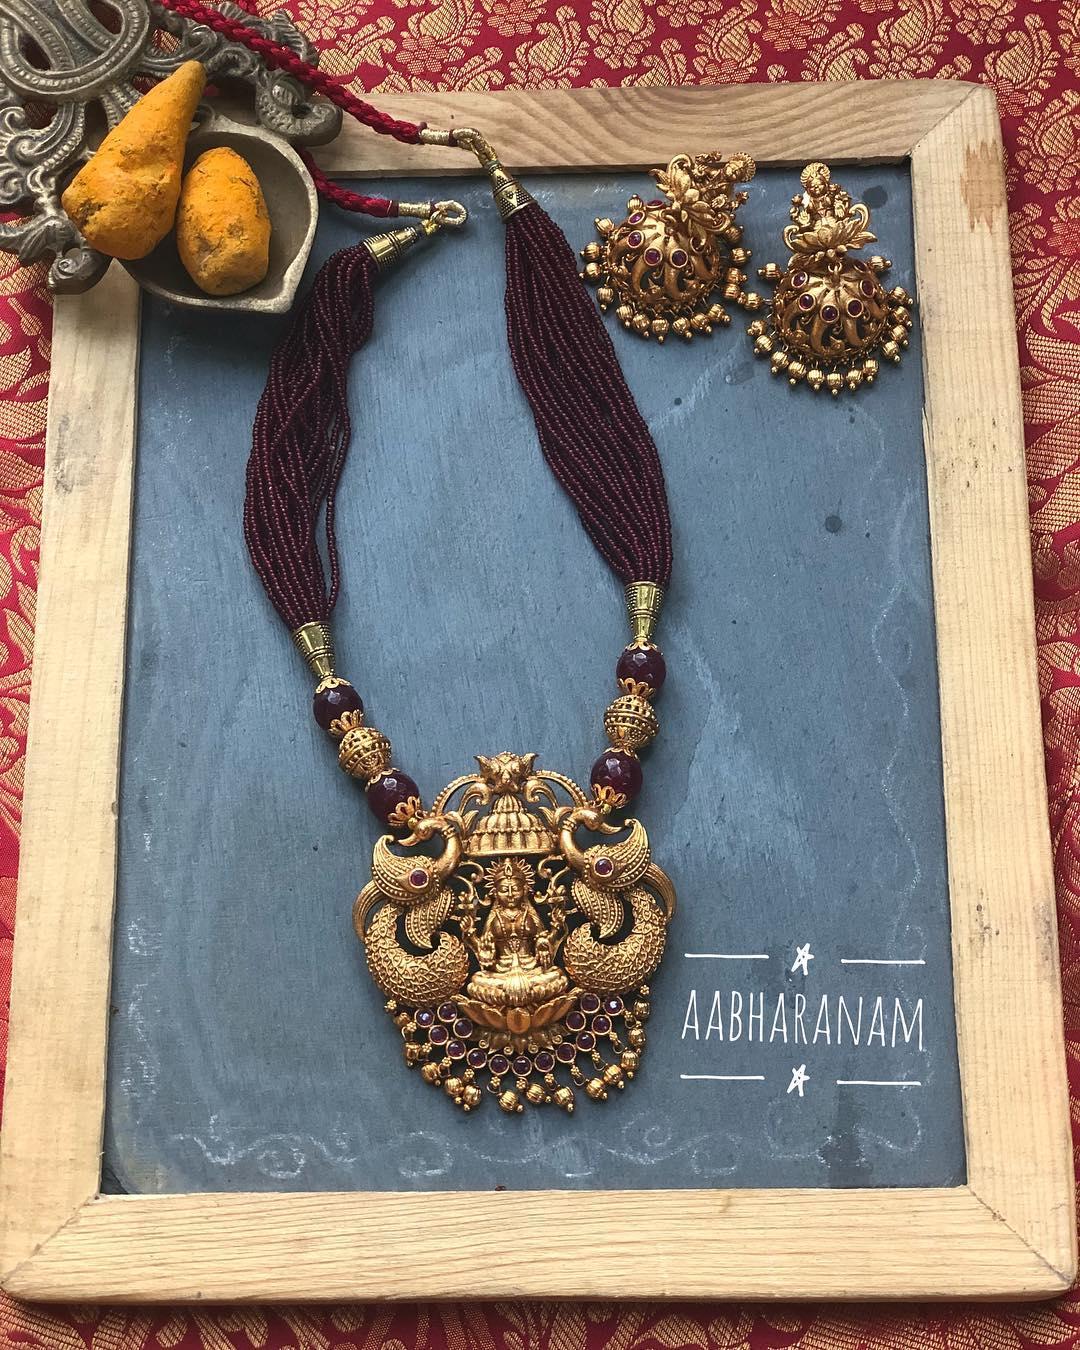 Antique Gold Finish lLakshmi Necklace From Abharanam